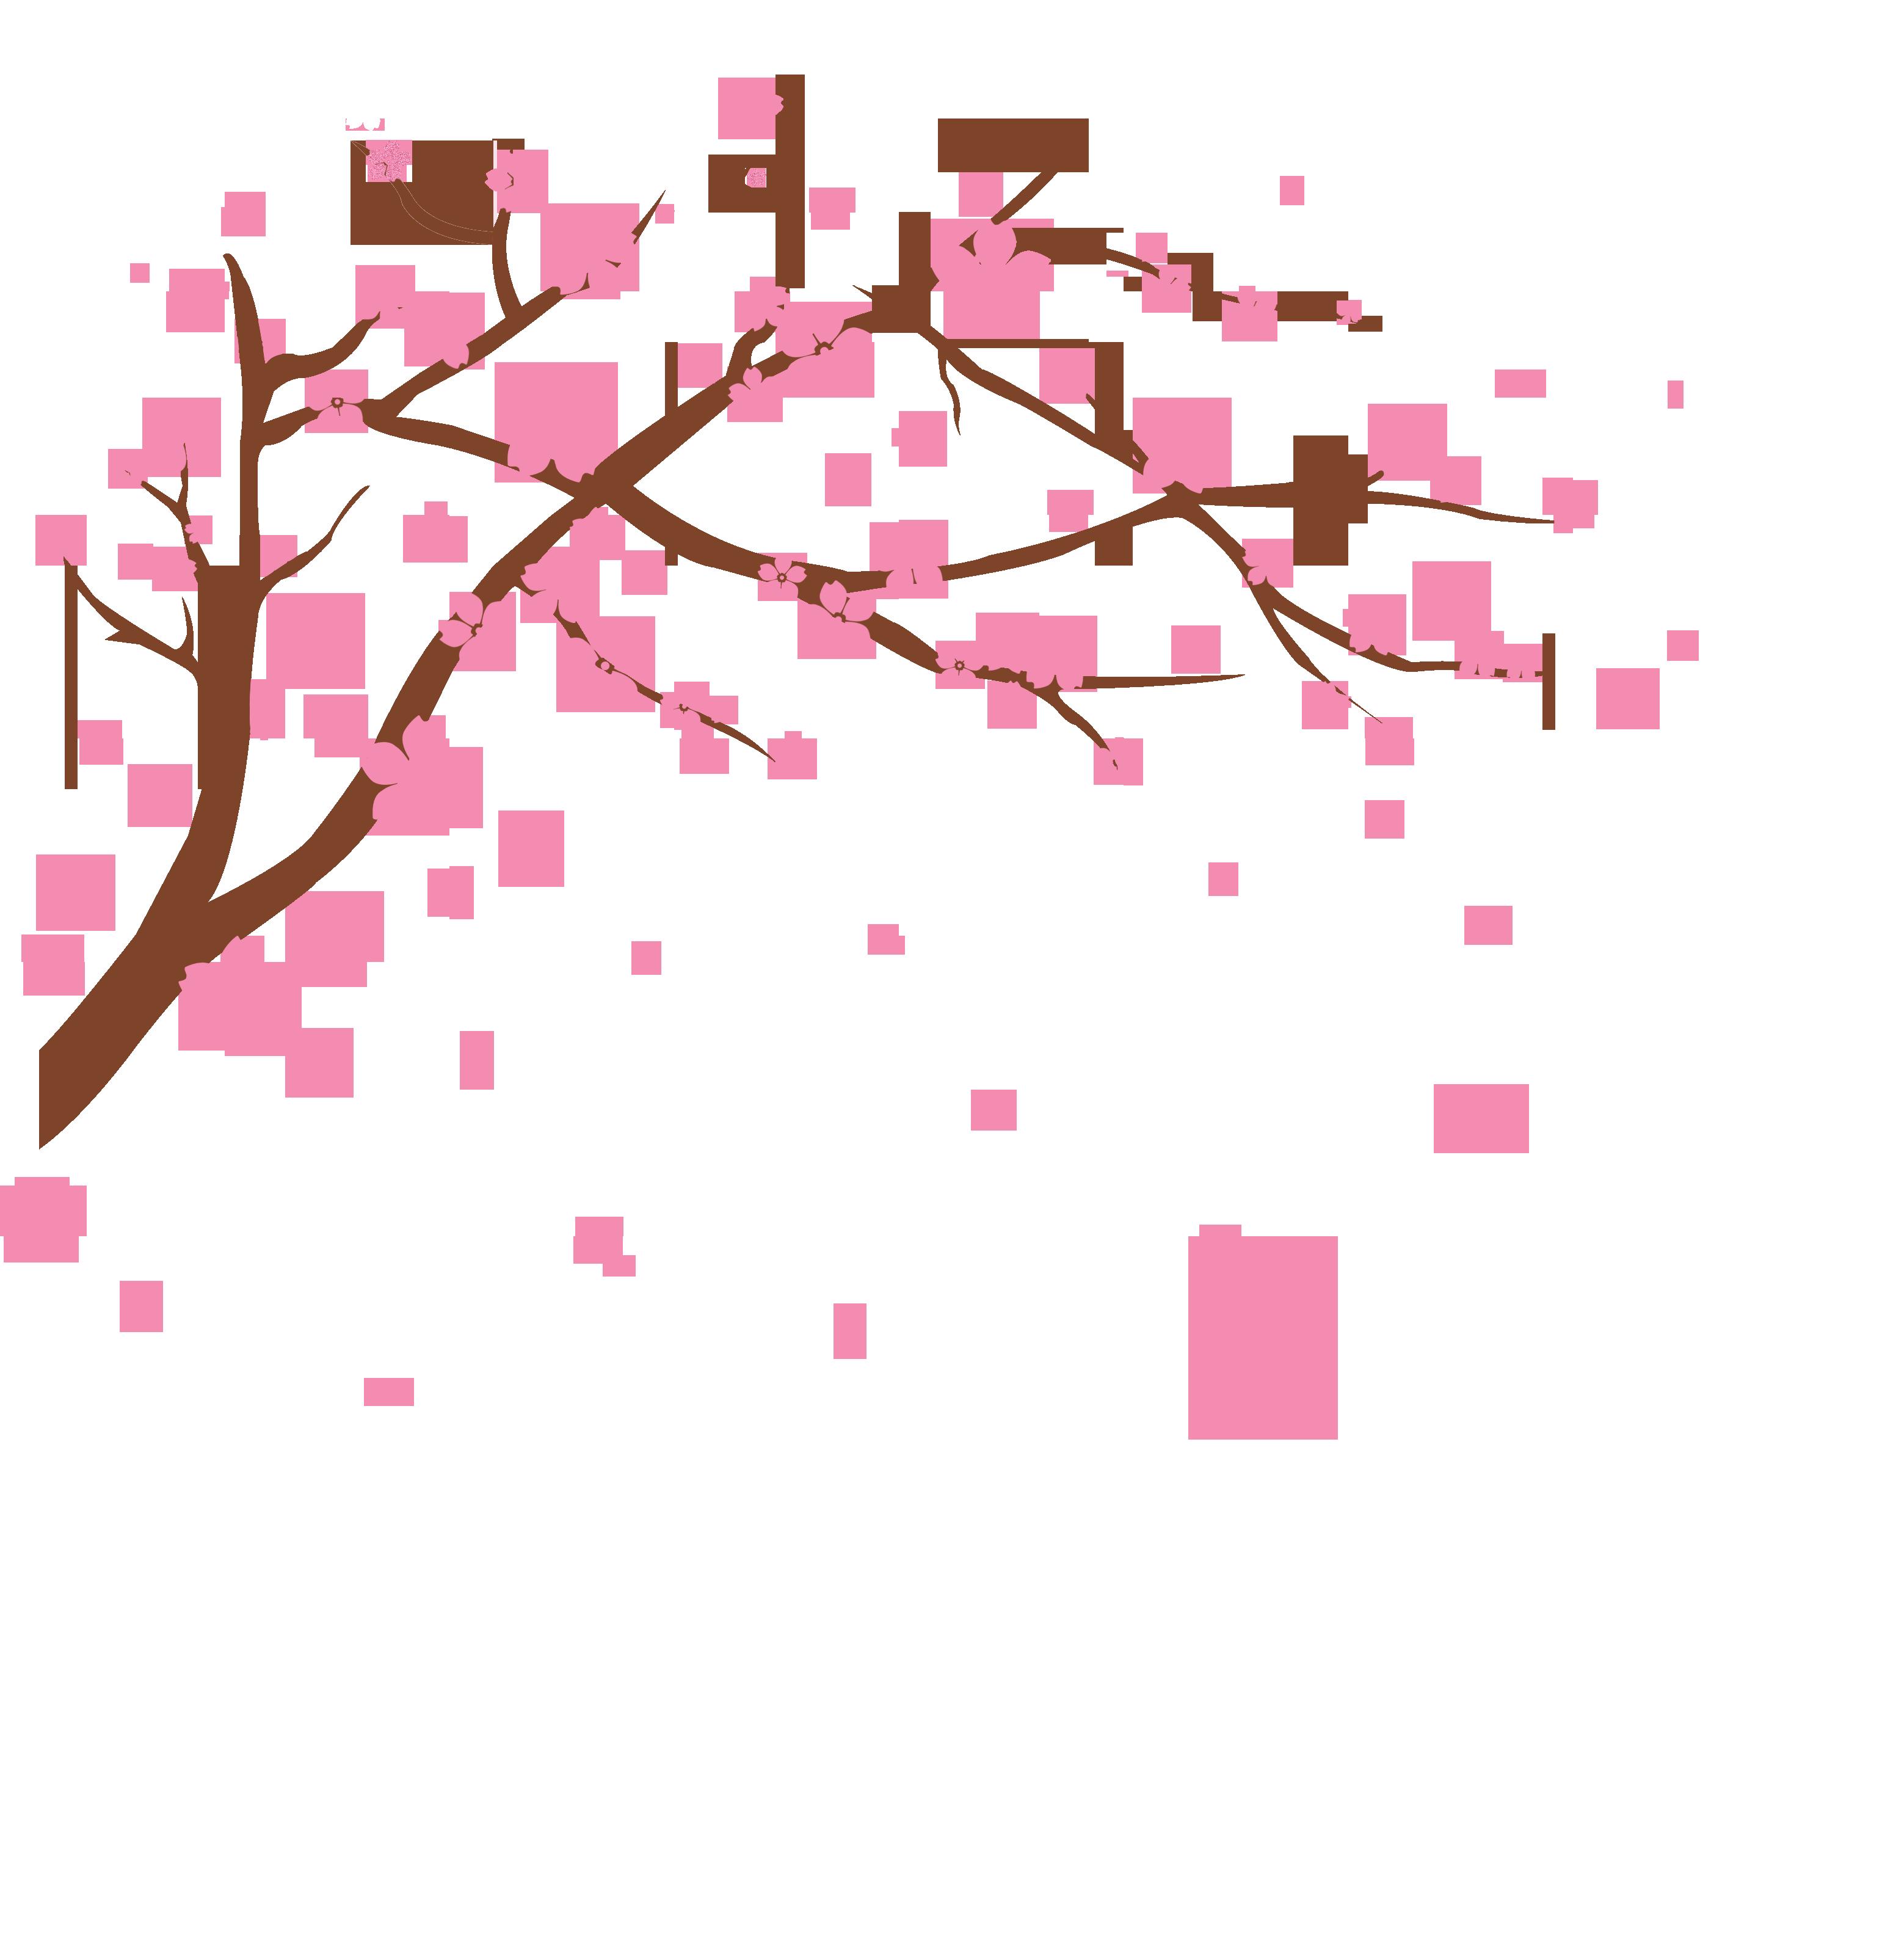 Cherry tree branch clipart jpg black and white Cherry blossom Clip art - Vector cherry 3105*3209 transprent Png ... jpg black and white